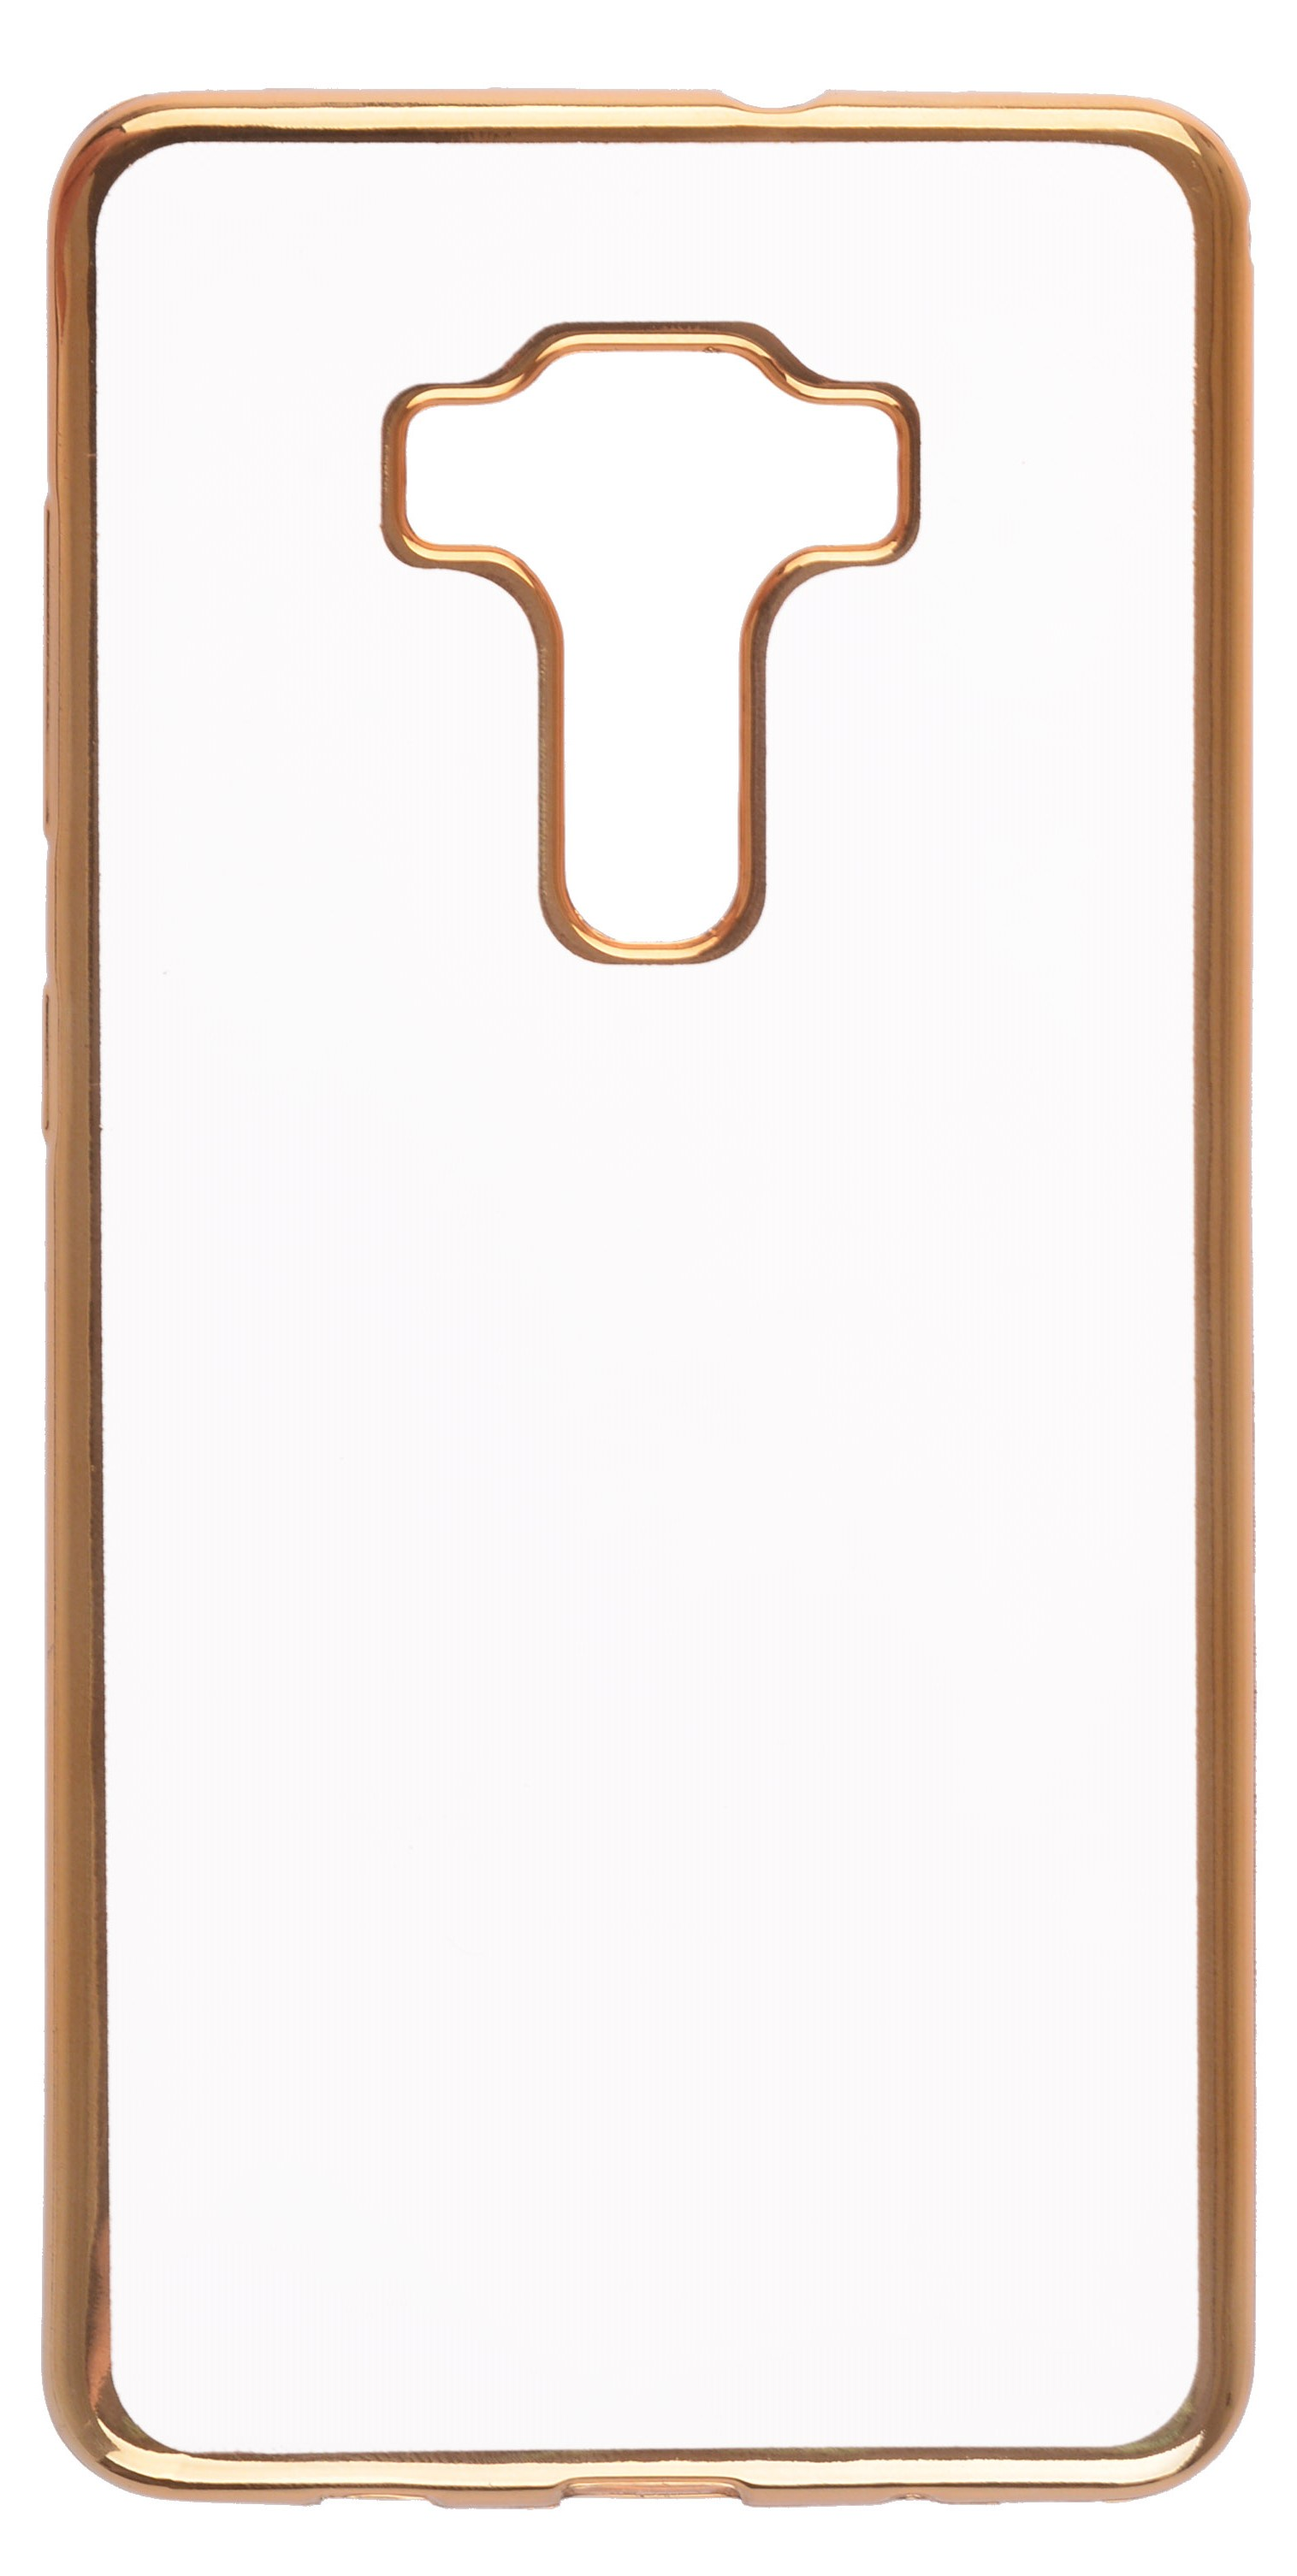 все цены на Чехол для сотового телефона skinBOX Silicone chrome border, 4630042524682, золотой онлайн